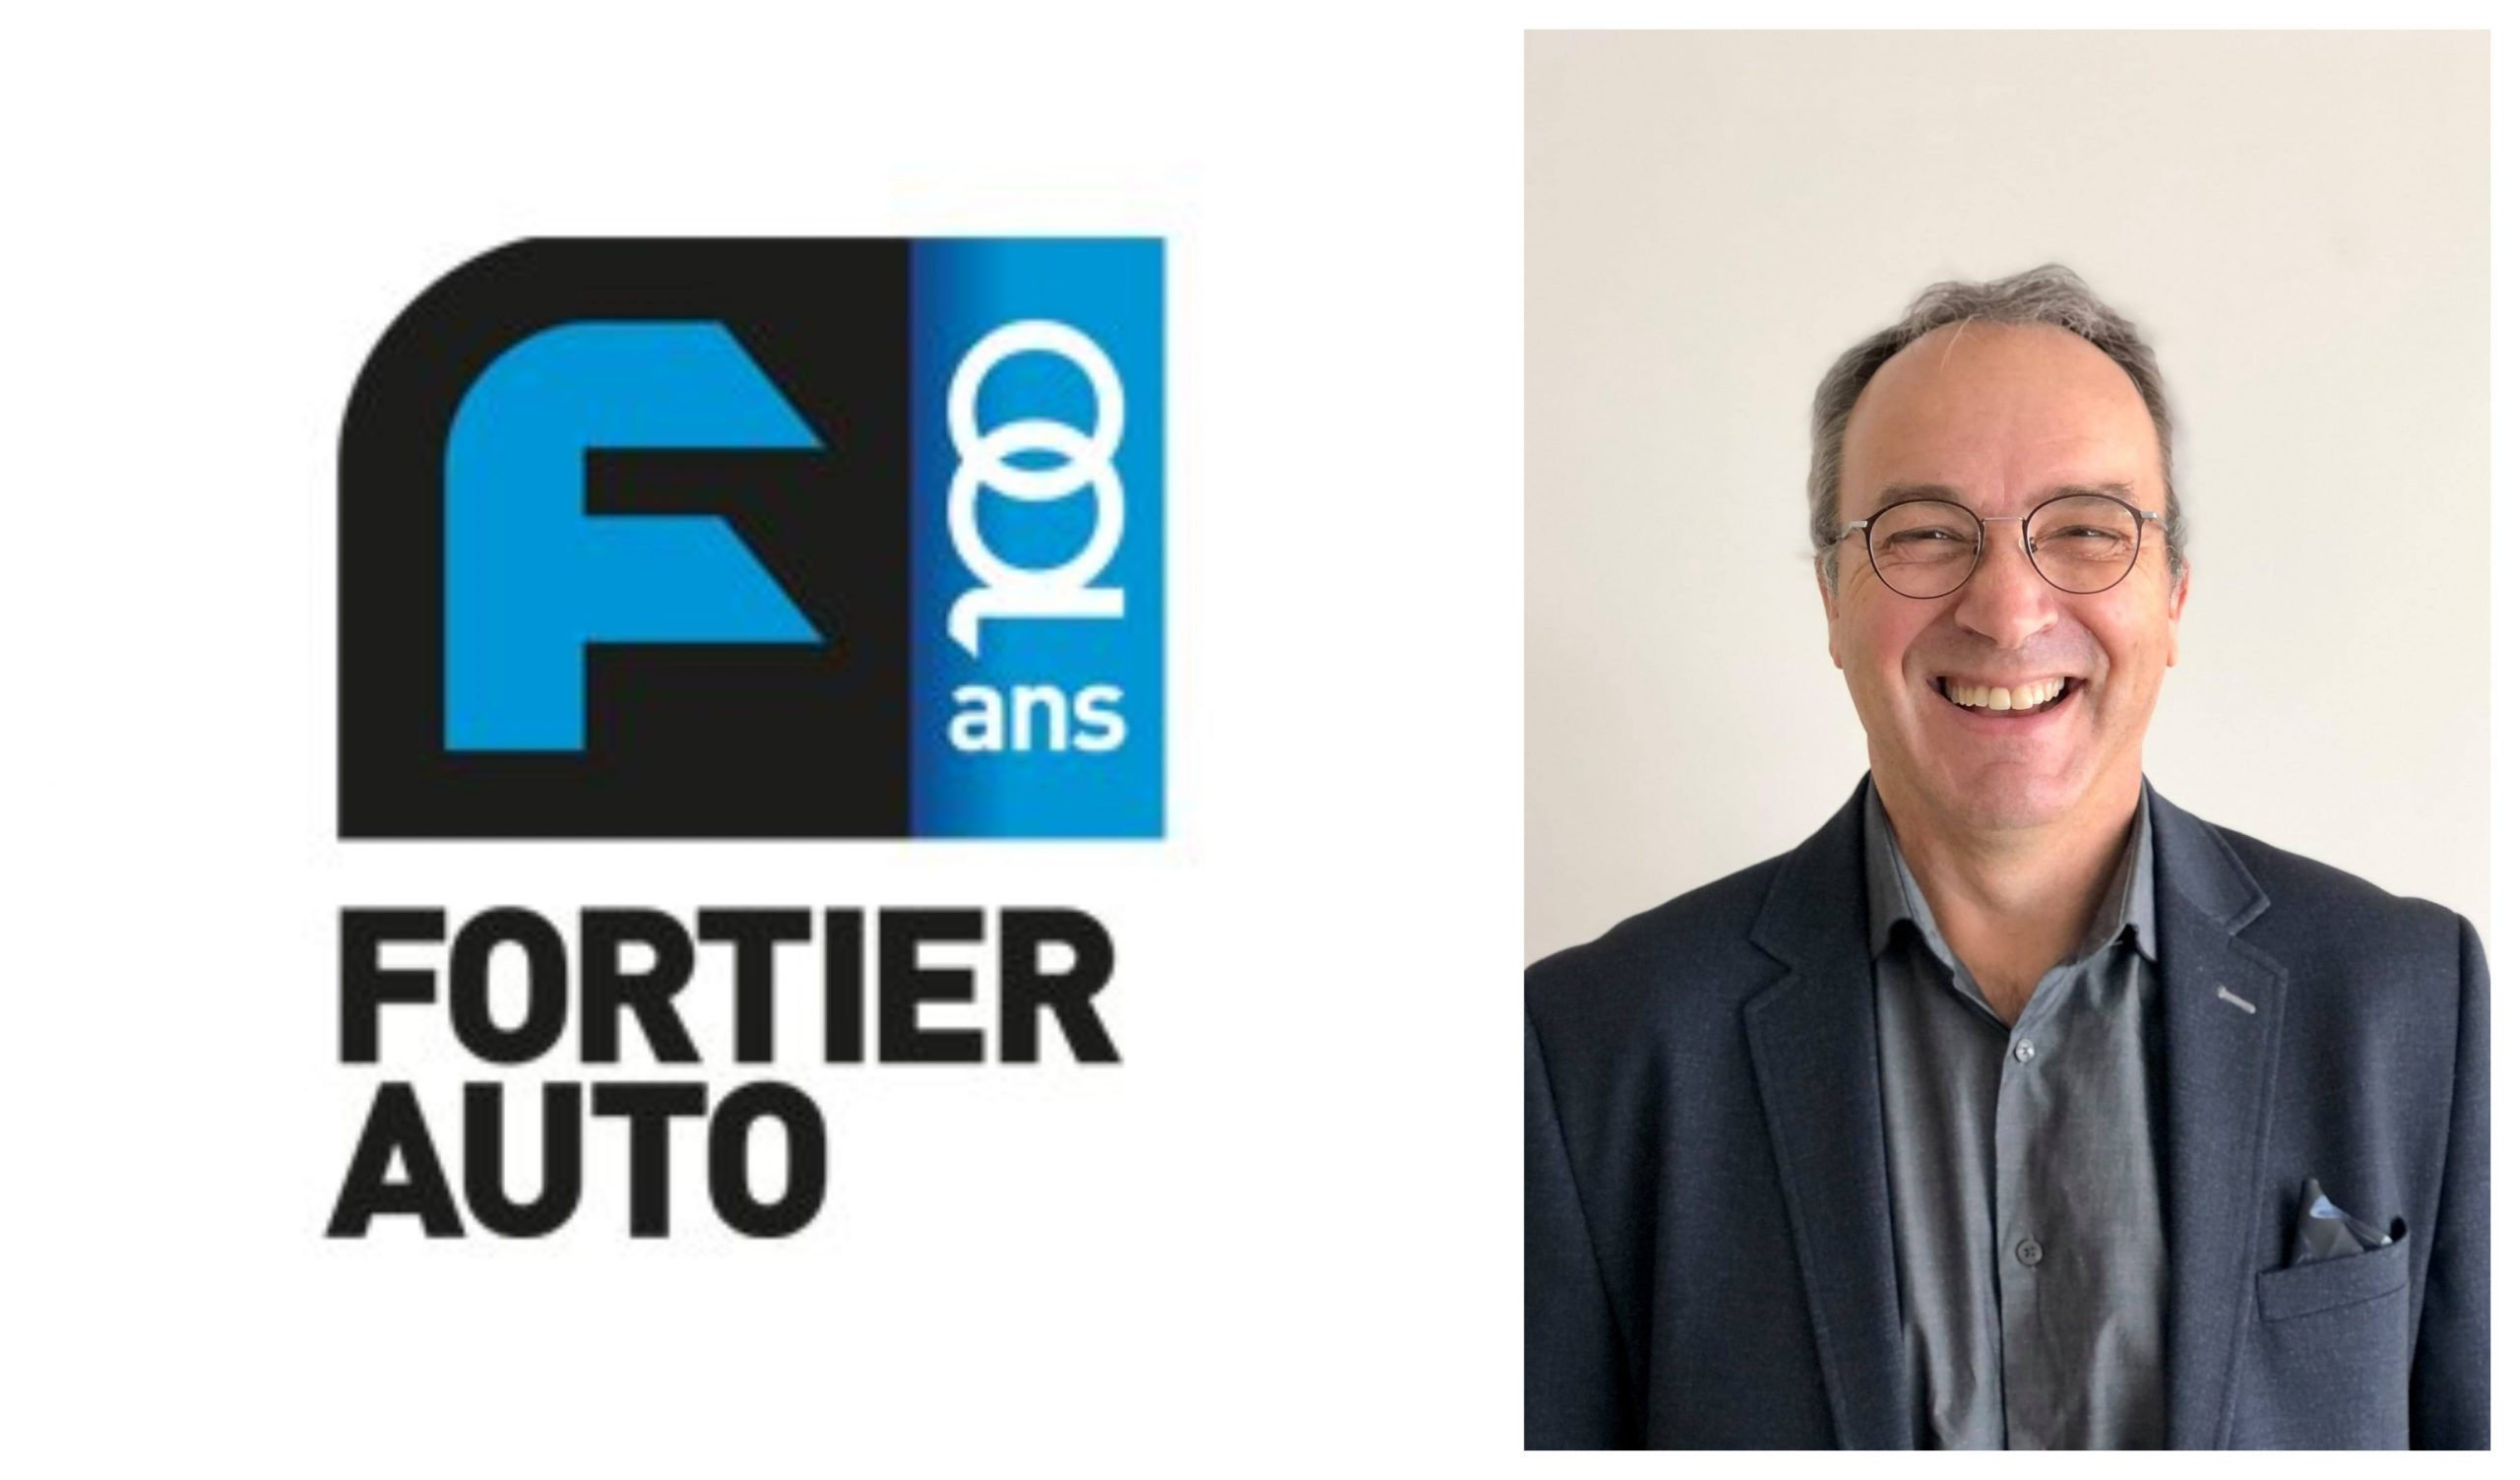 Jean-Guy Carvalho, Fortier Auto